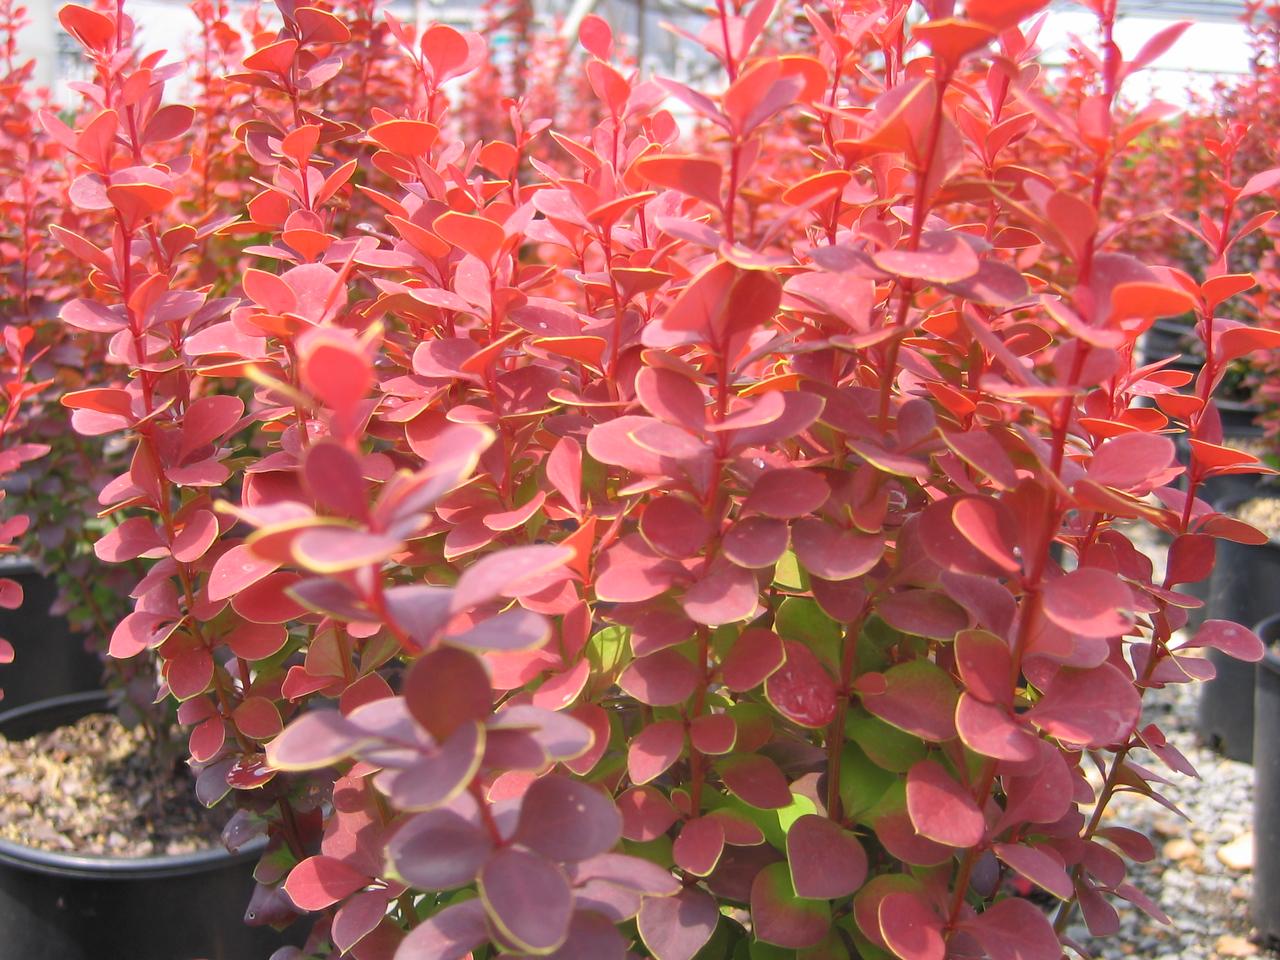 Orange Rocket Barberry PP18411 http://www.gardendebut.com/orange-rocket-barberry.php